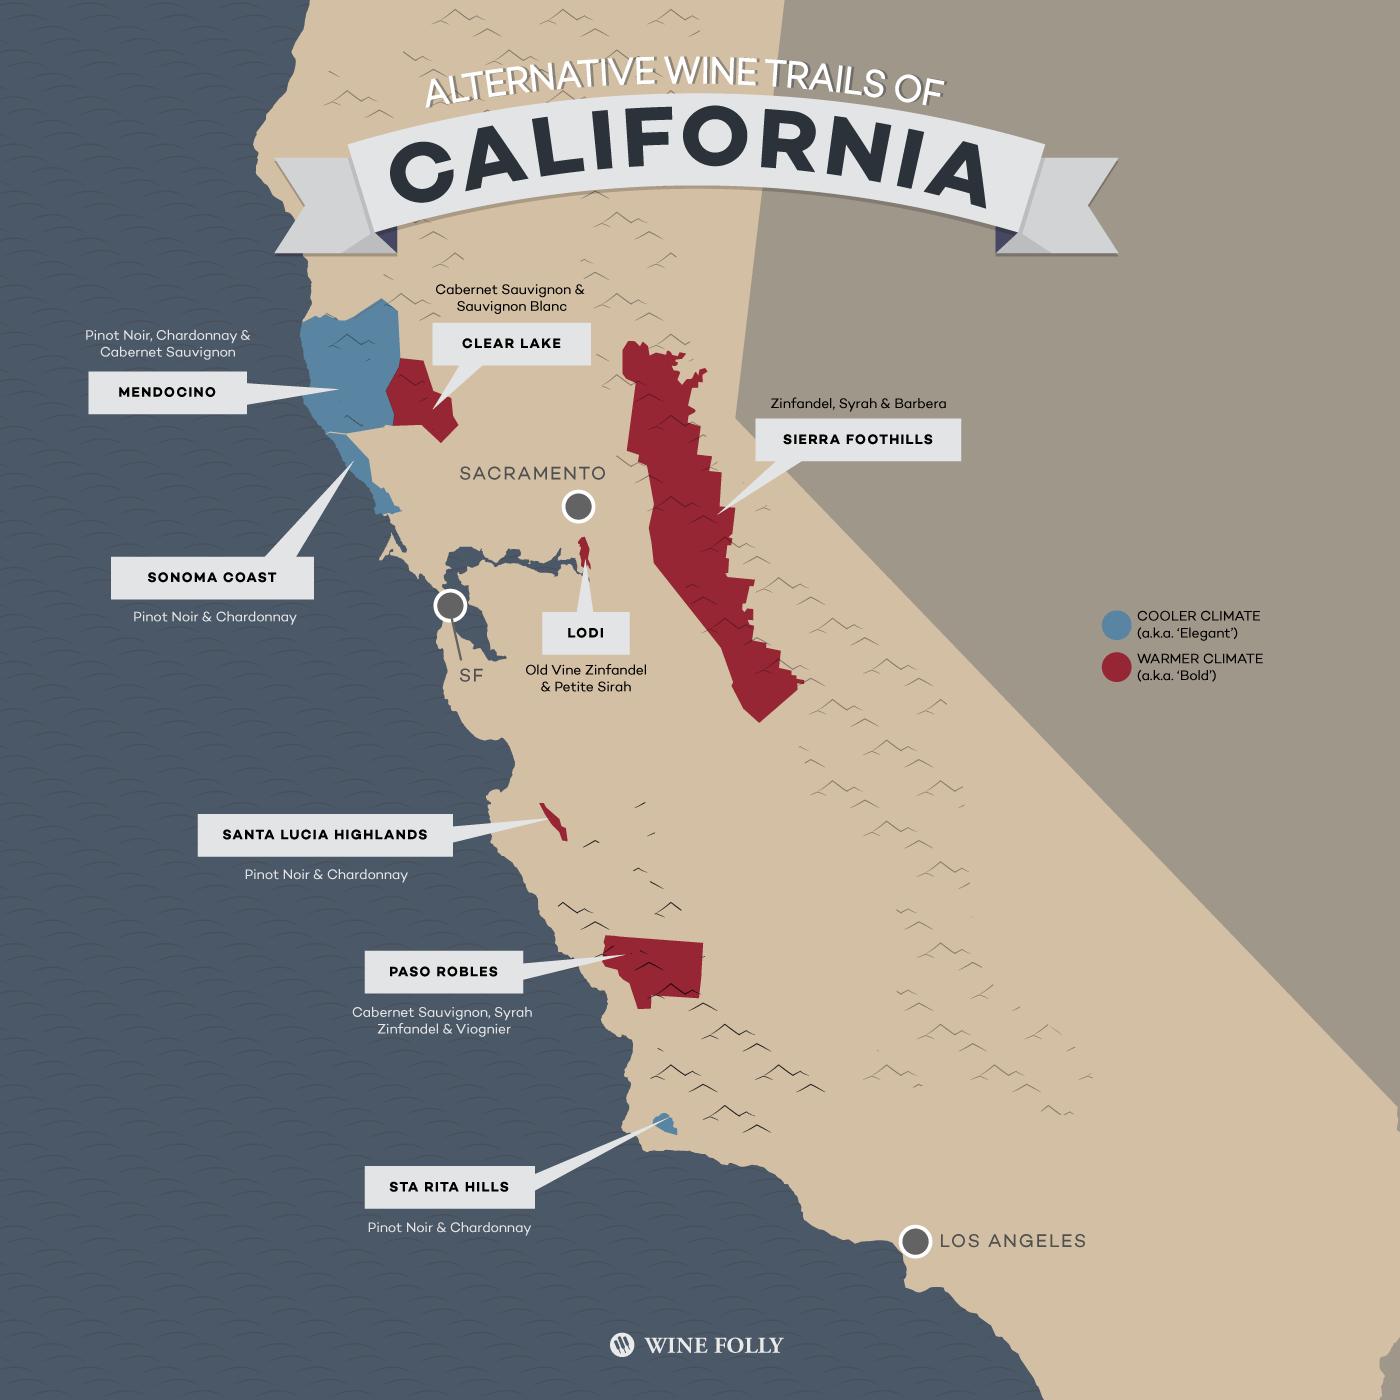 santa lucia highlands map 8 Alternative Wine Trails Of California Wine Folly Santa Lucia santa lucia highlands map